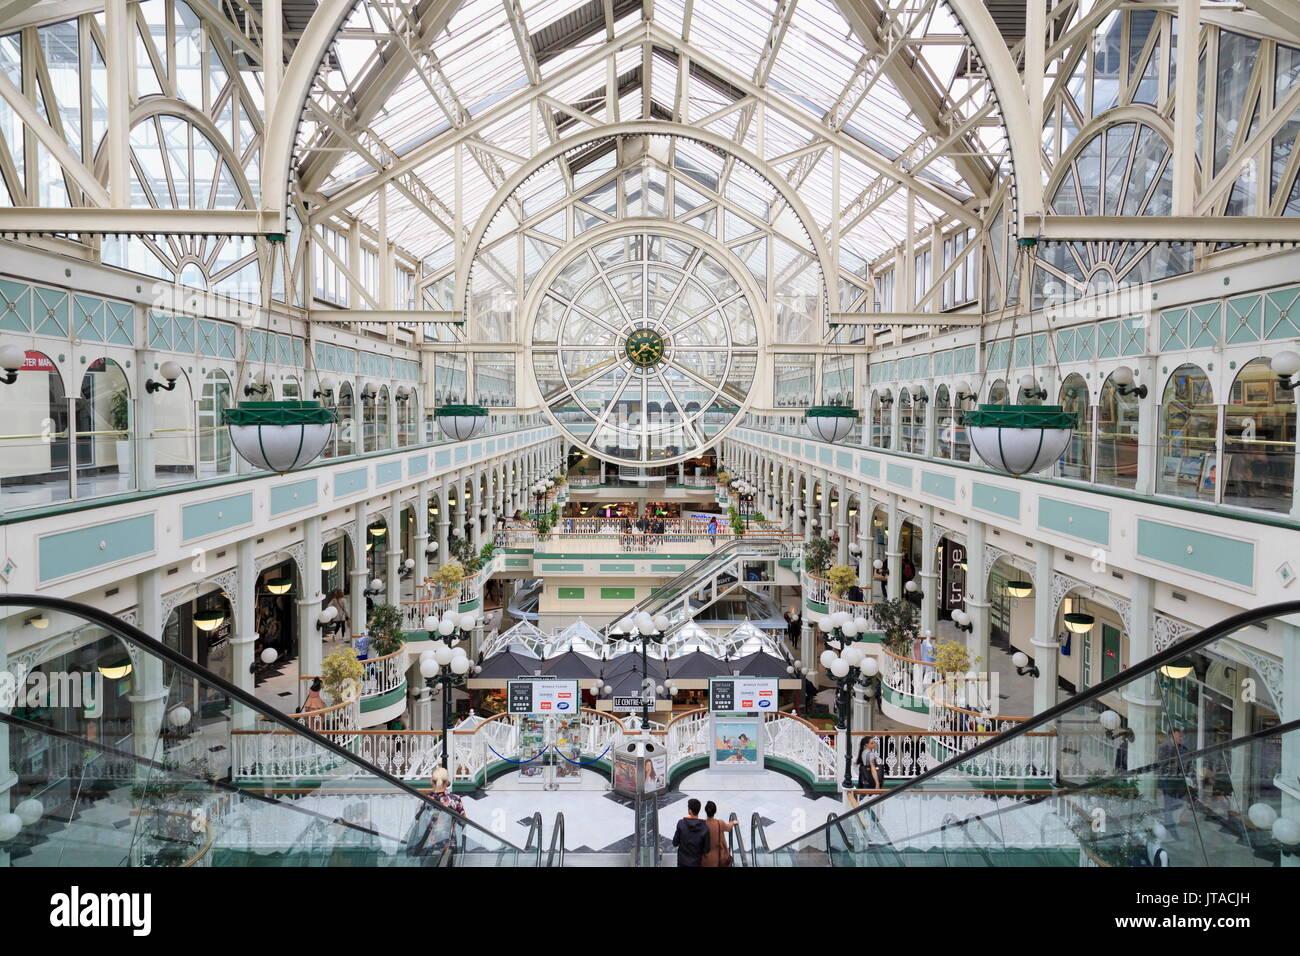 Stephen's Green Shopping Centre, Dublin City, County Dublin, Republic of Ireland, Europe - Stock Image